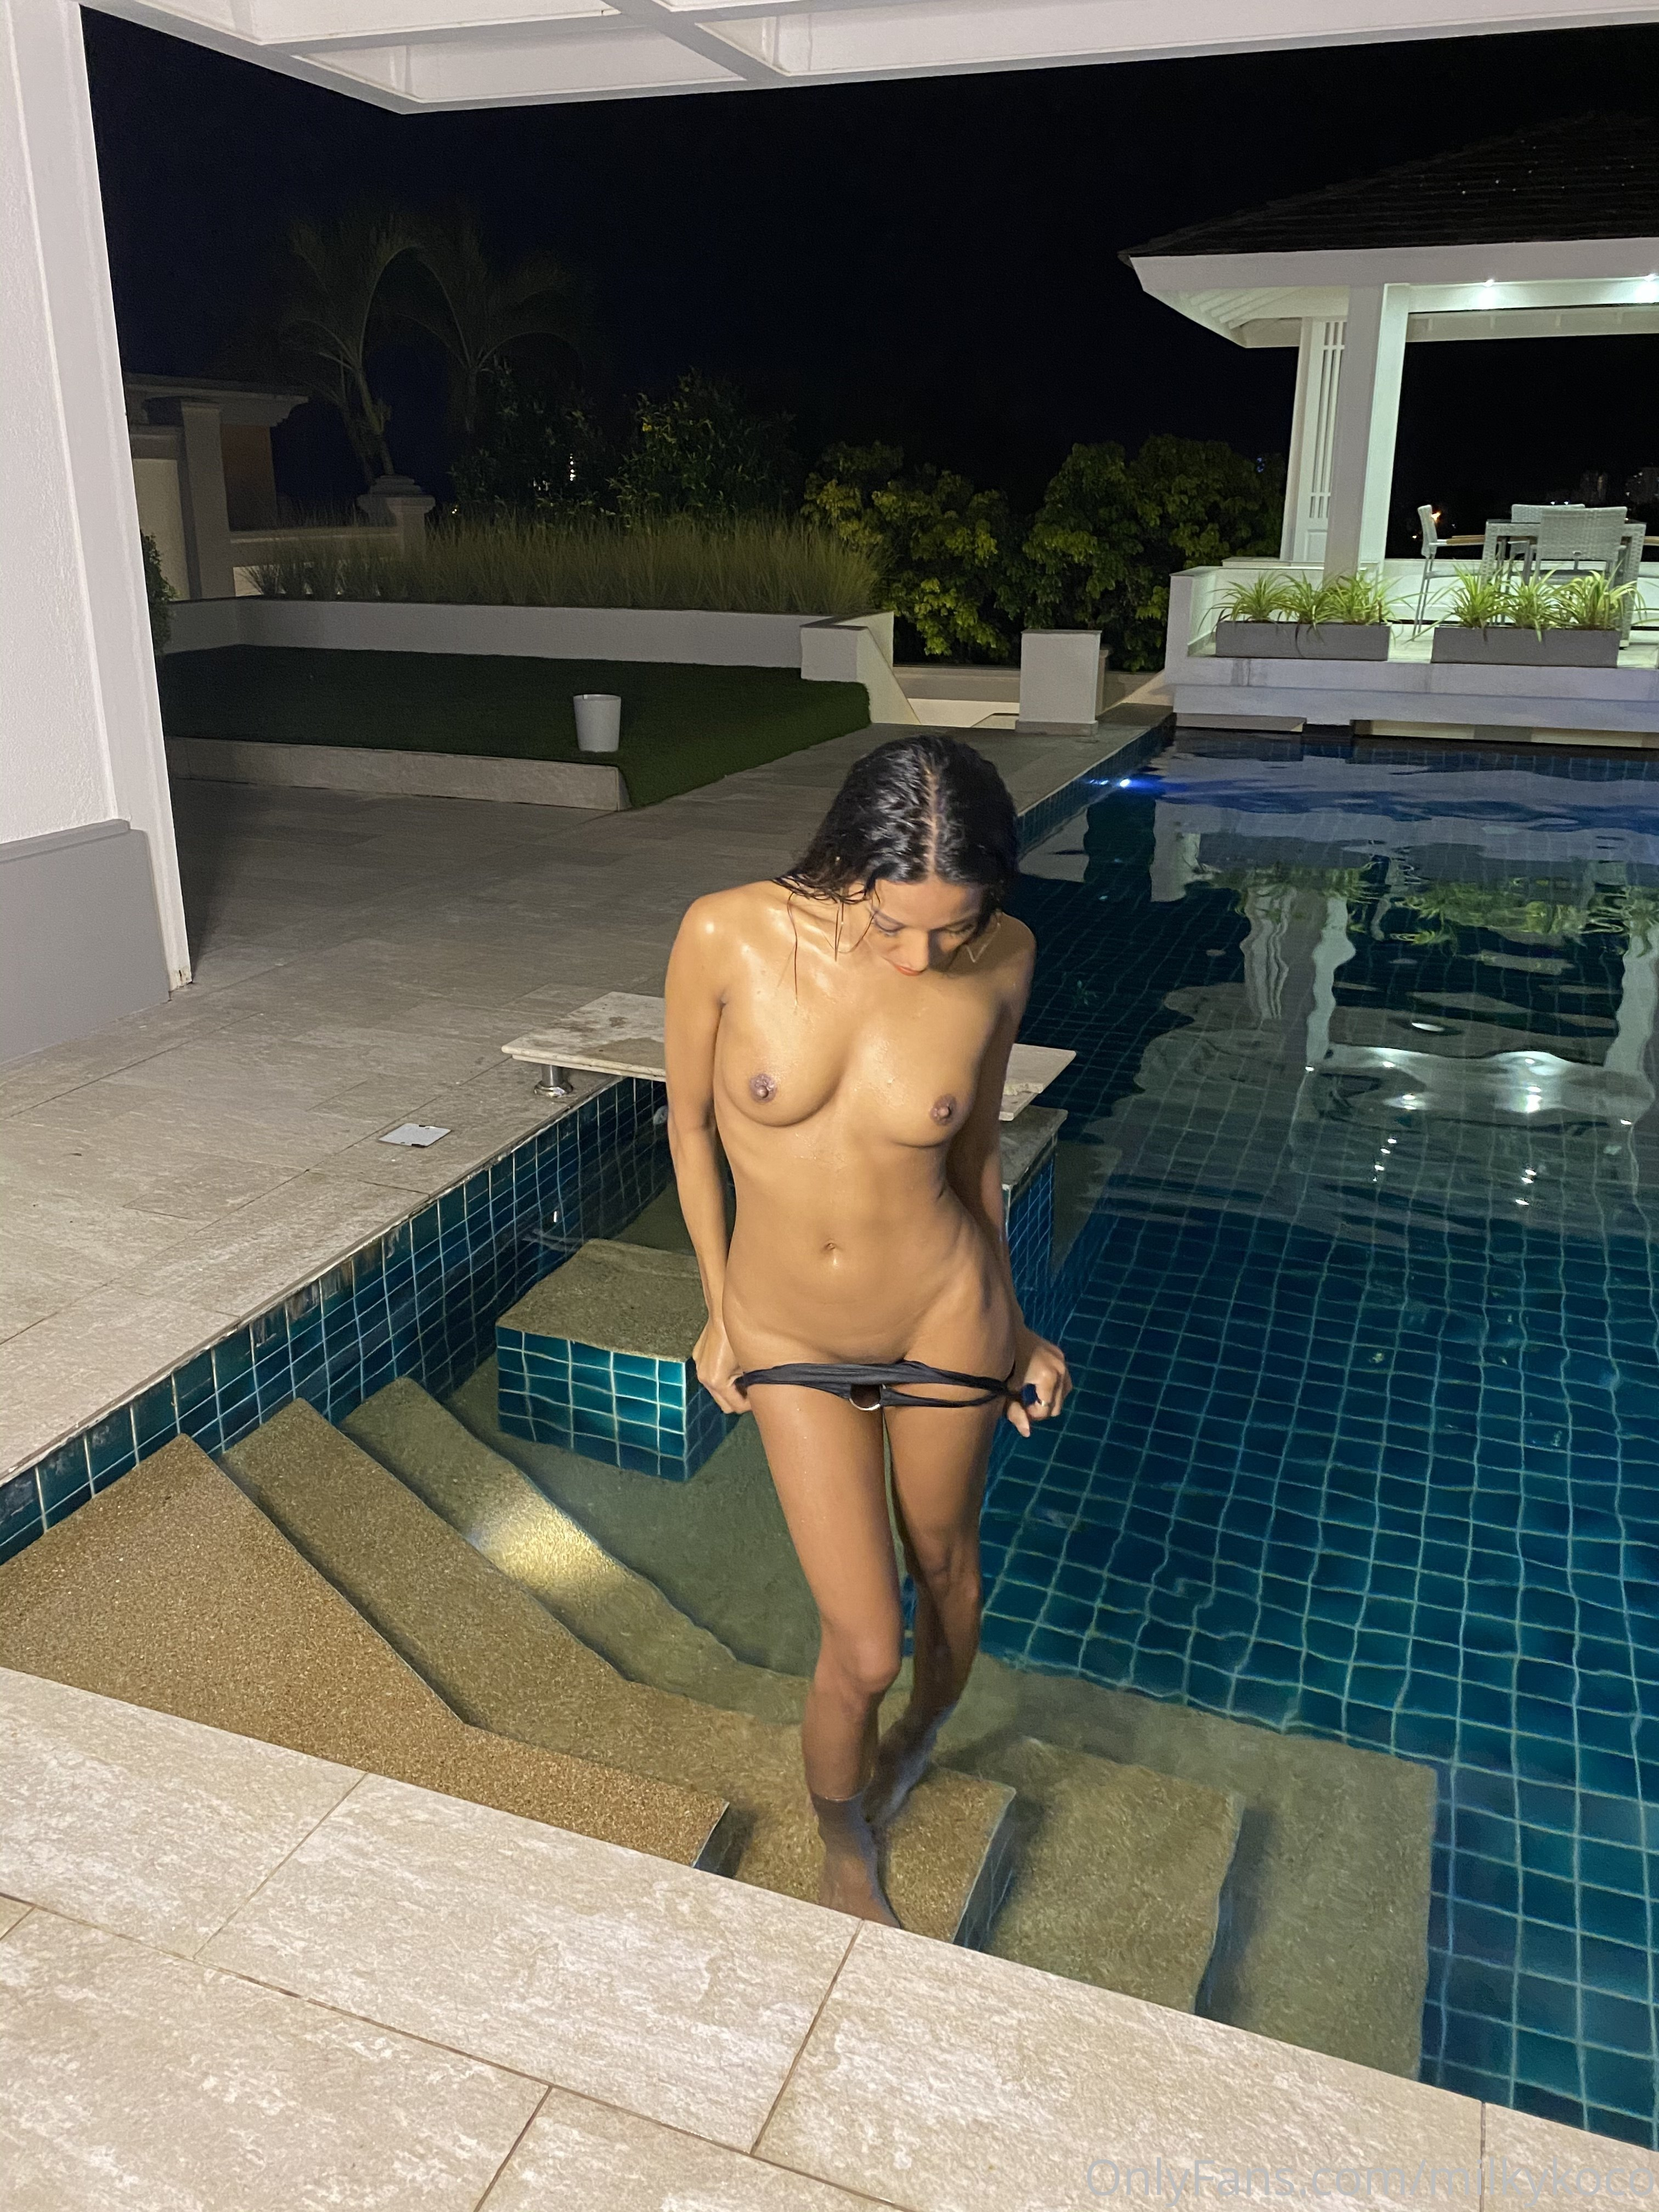 Koko Mylk Bangkok Model Leaked Onlyfans 0065